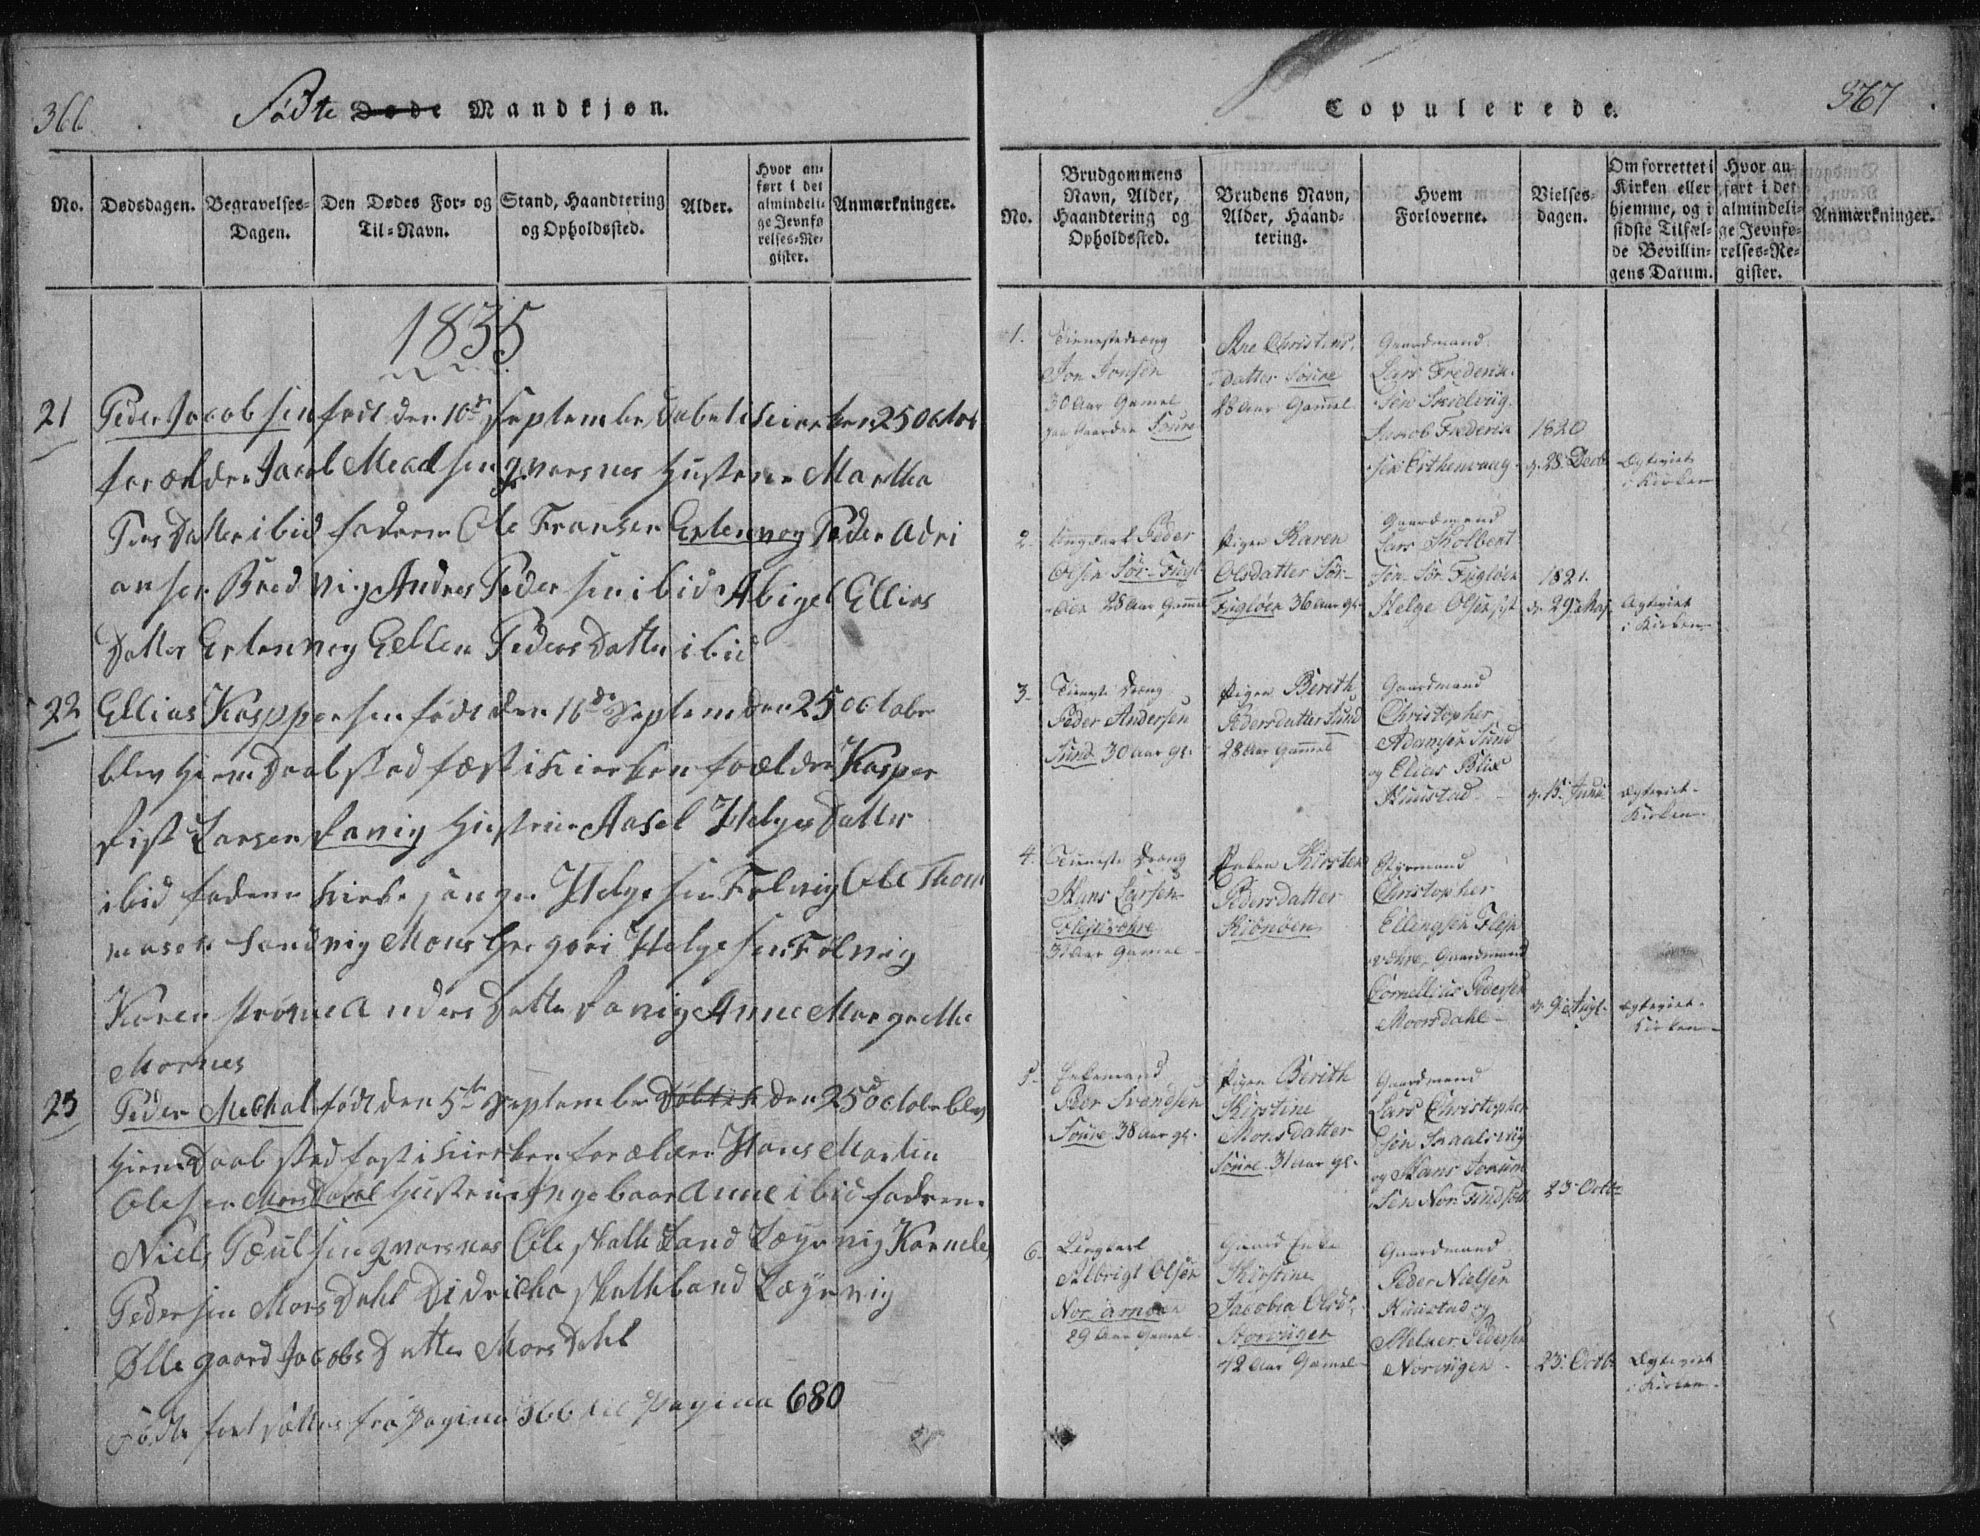 SAT, Ministerialprotokoller, klokkerbøker og fødselsregistre - Nordland, 805/L0096: Ministerialbok nr. 805A03, 1820-1837, s. 366-367